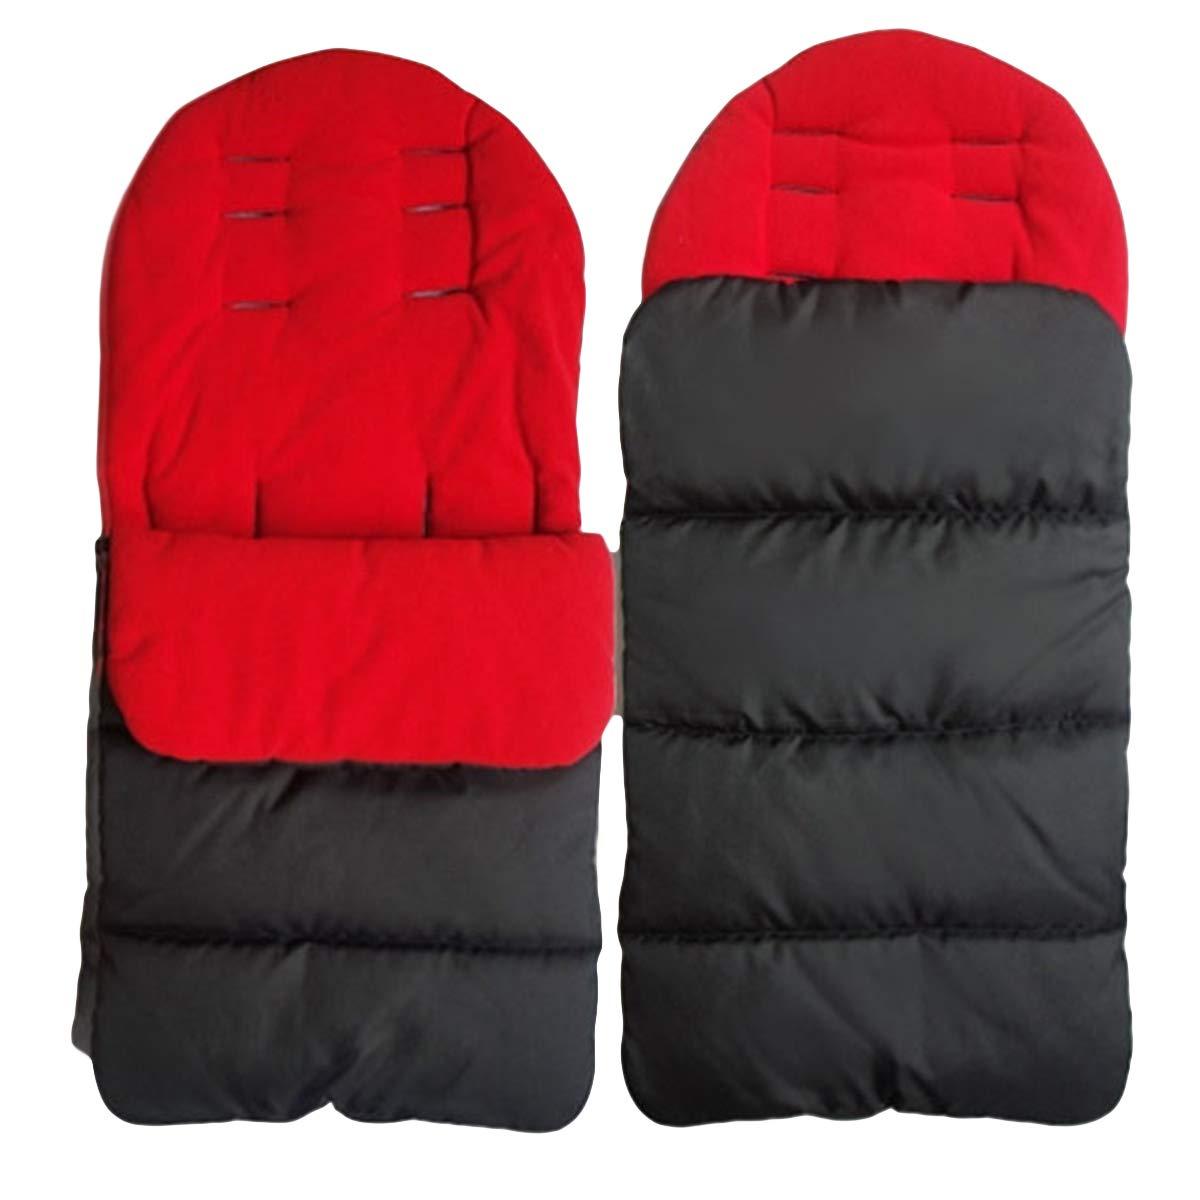 Tabpole Baby Bunting Bag Universal 3-in-1 Stroller Windproof Warm Sleeping Bag Toddler Footmuff for Car Seat Stroller